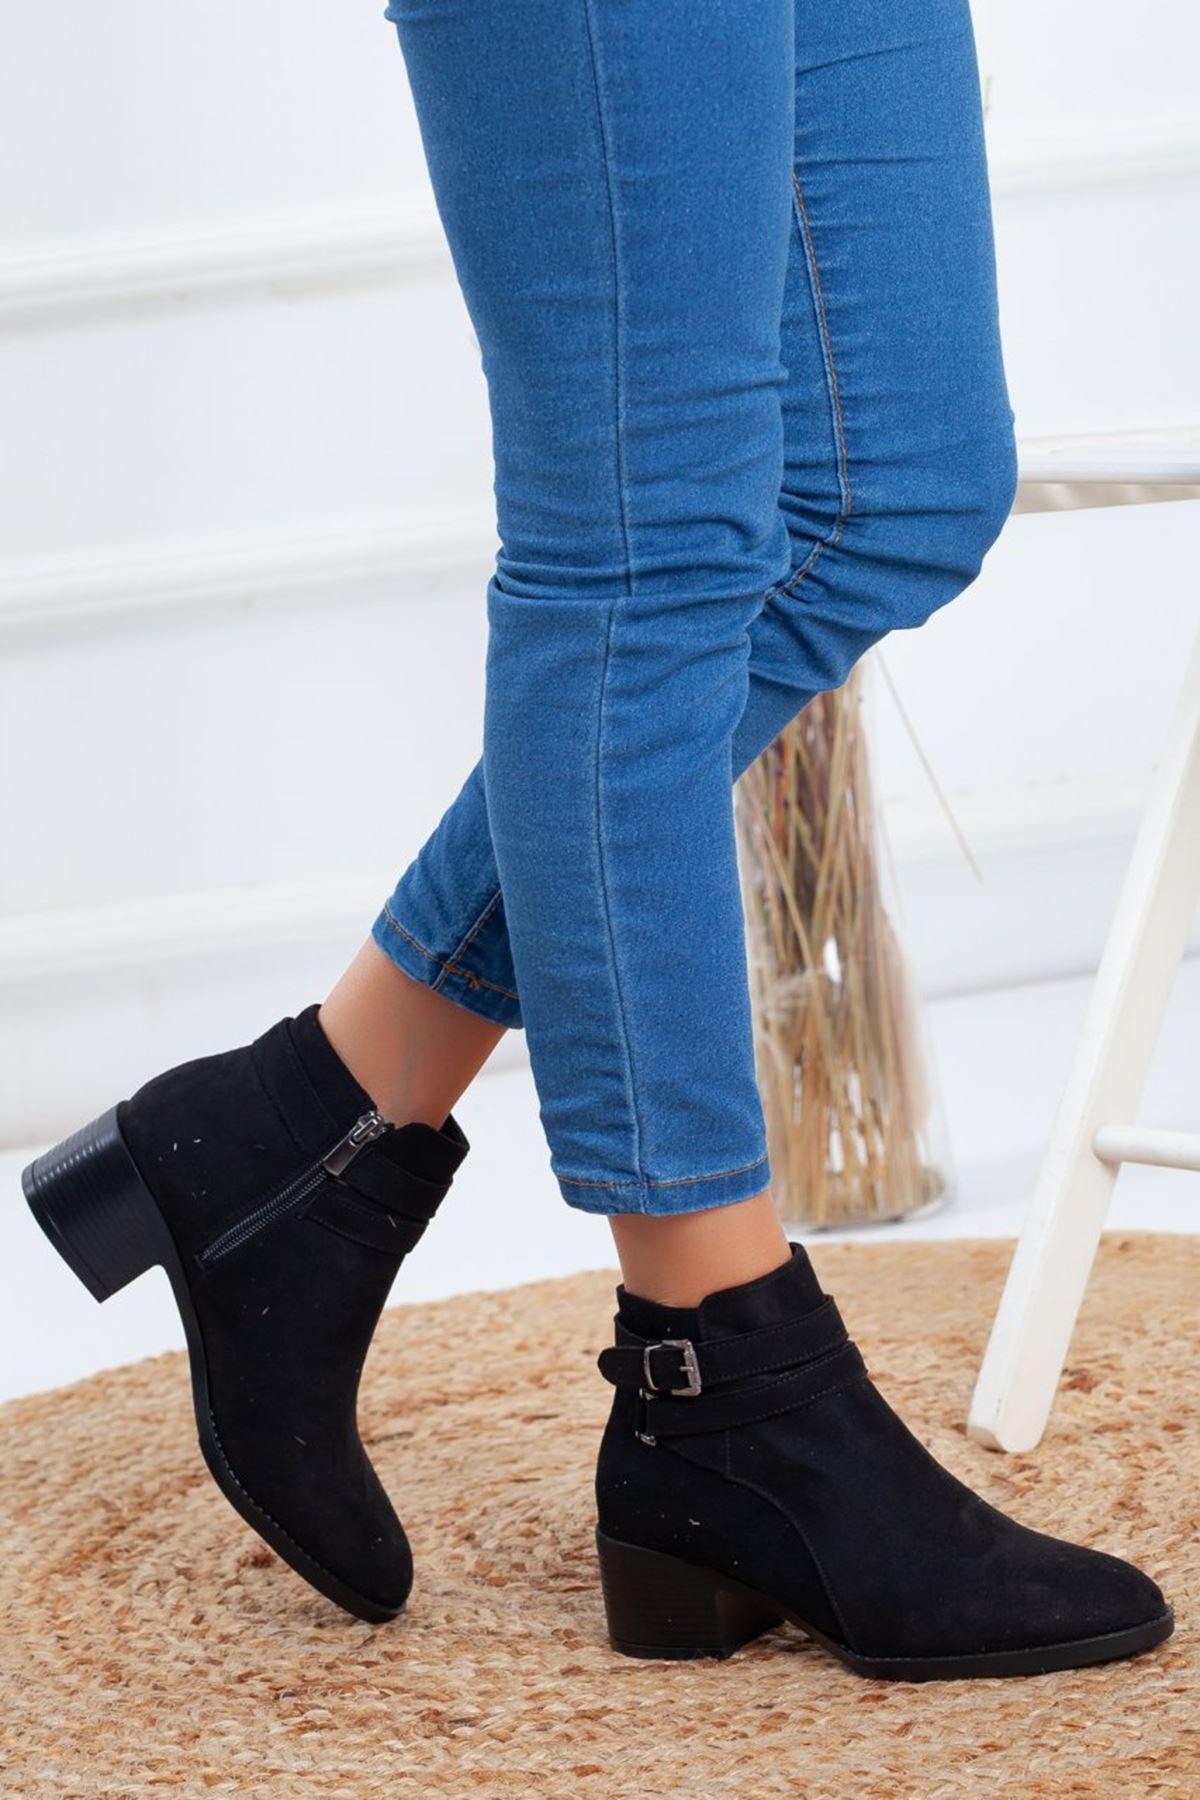 Kadın Zenam Kısa Topuklu Toka Detay Siyah Süet Bot